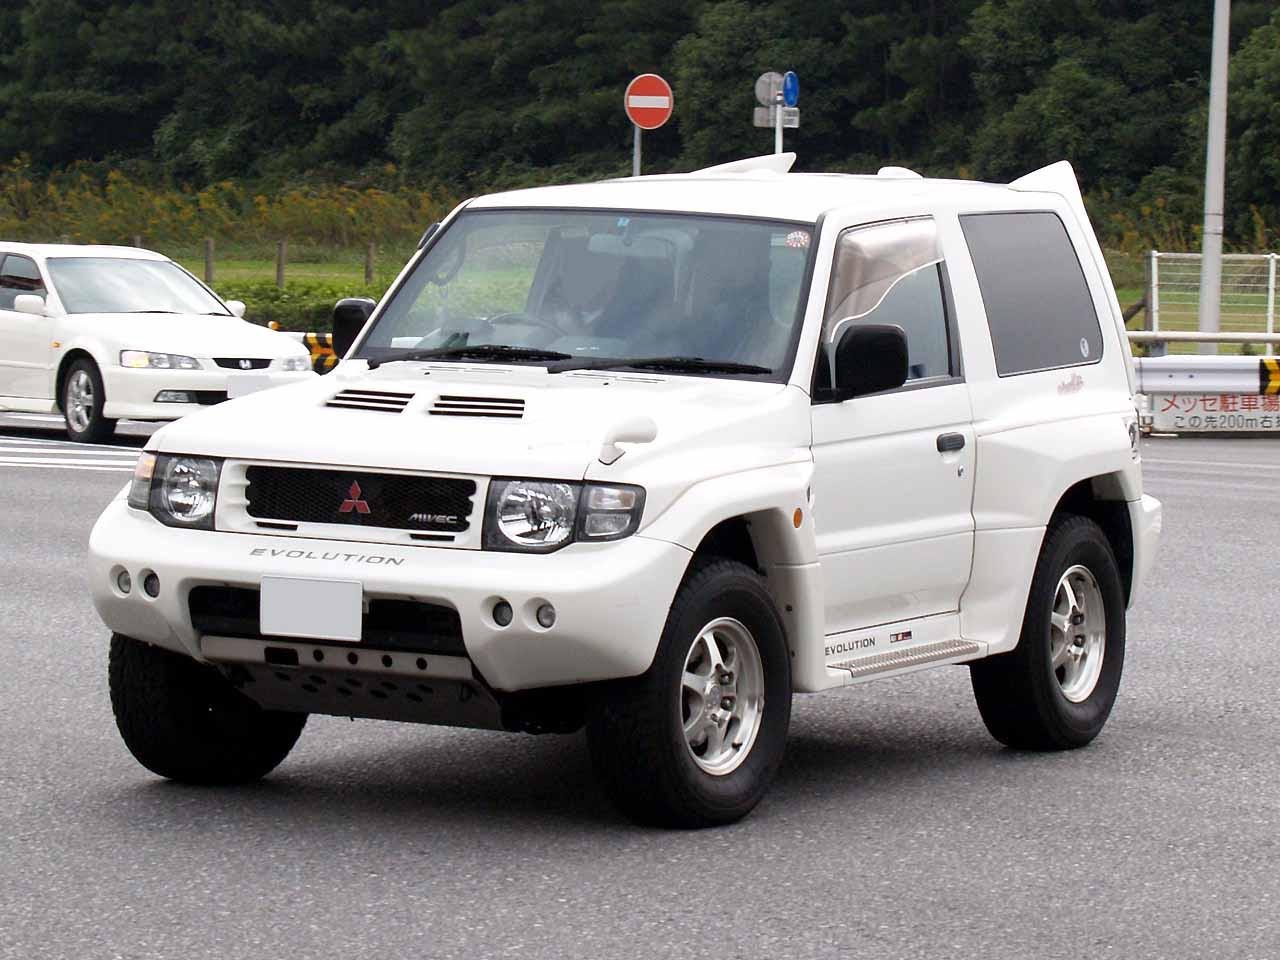 Mitsubishi Pajero Pinin — Wikipédia